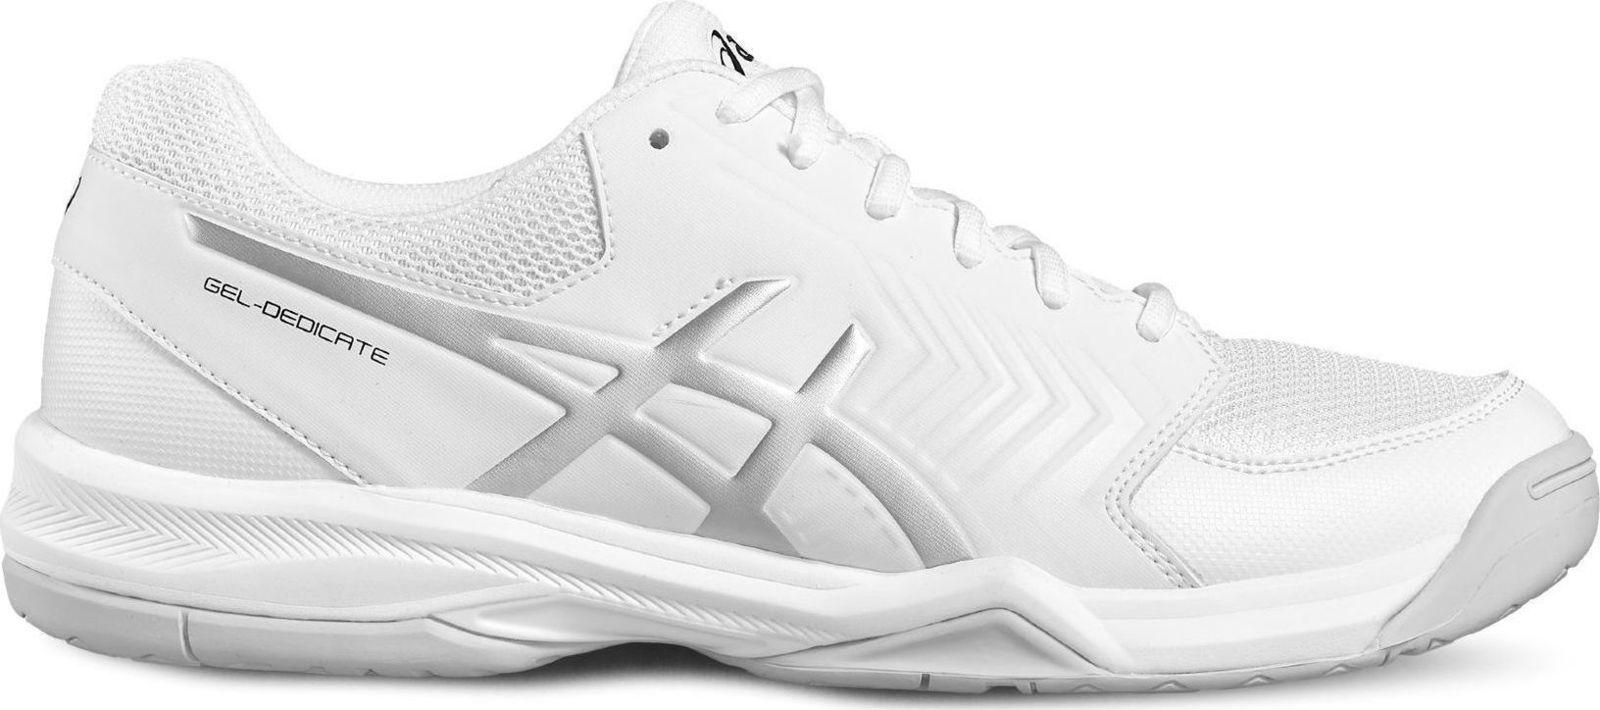 Asics E707Y 0193 Gel-Dedicate 5 White Silver Mens Tennis Sho